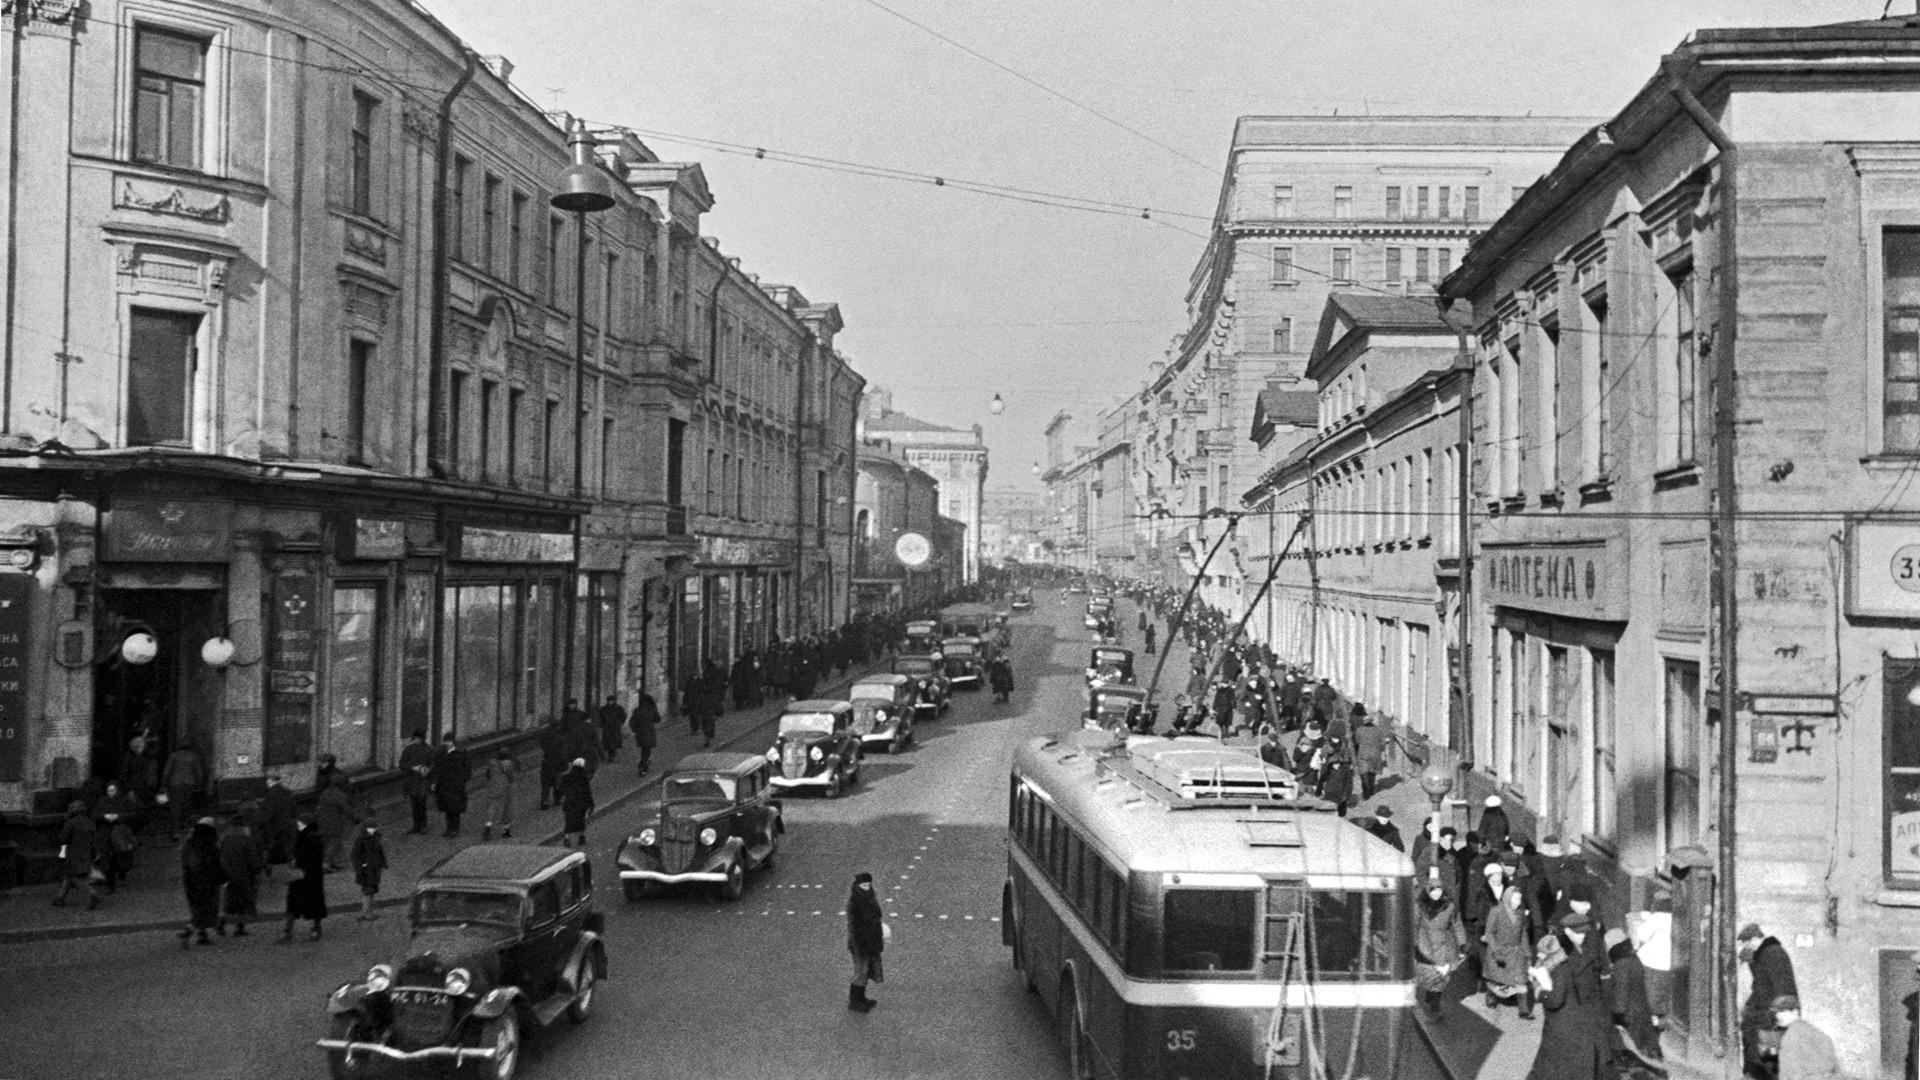 Gorky Street (now Tverskaya) in Soviet era.